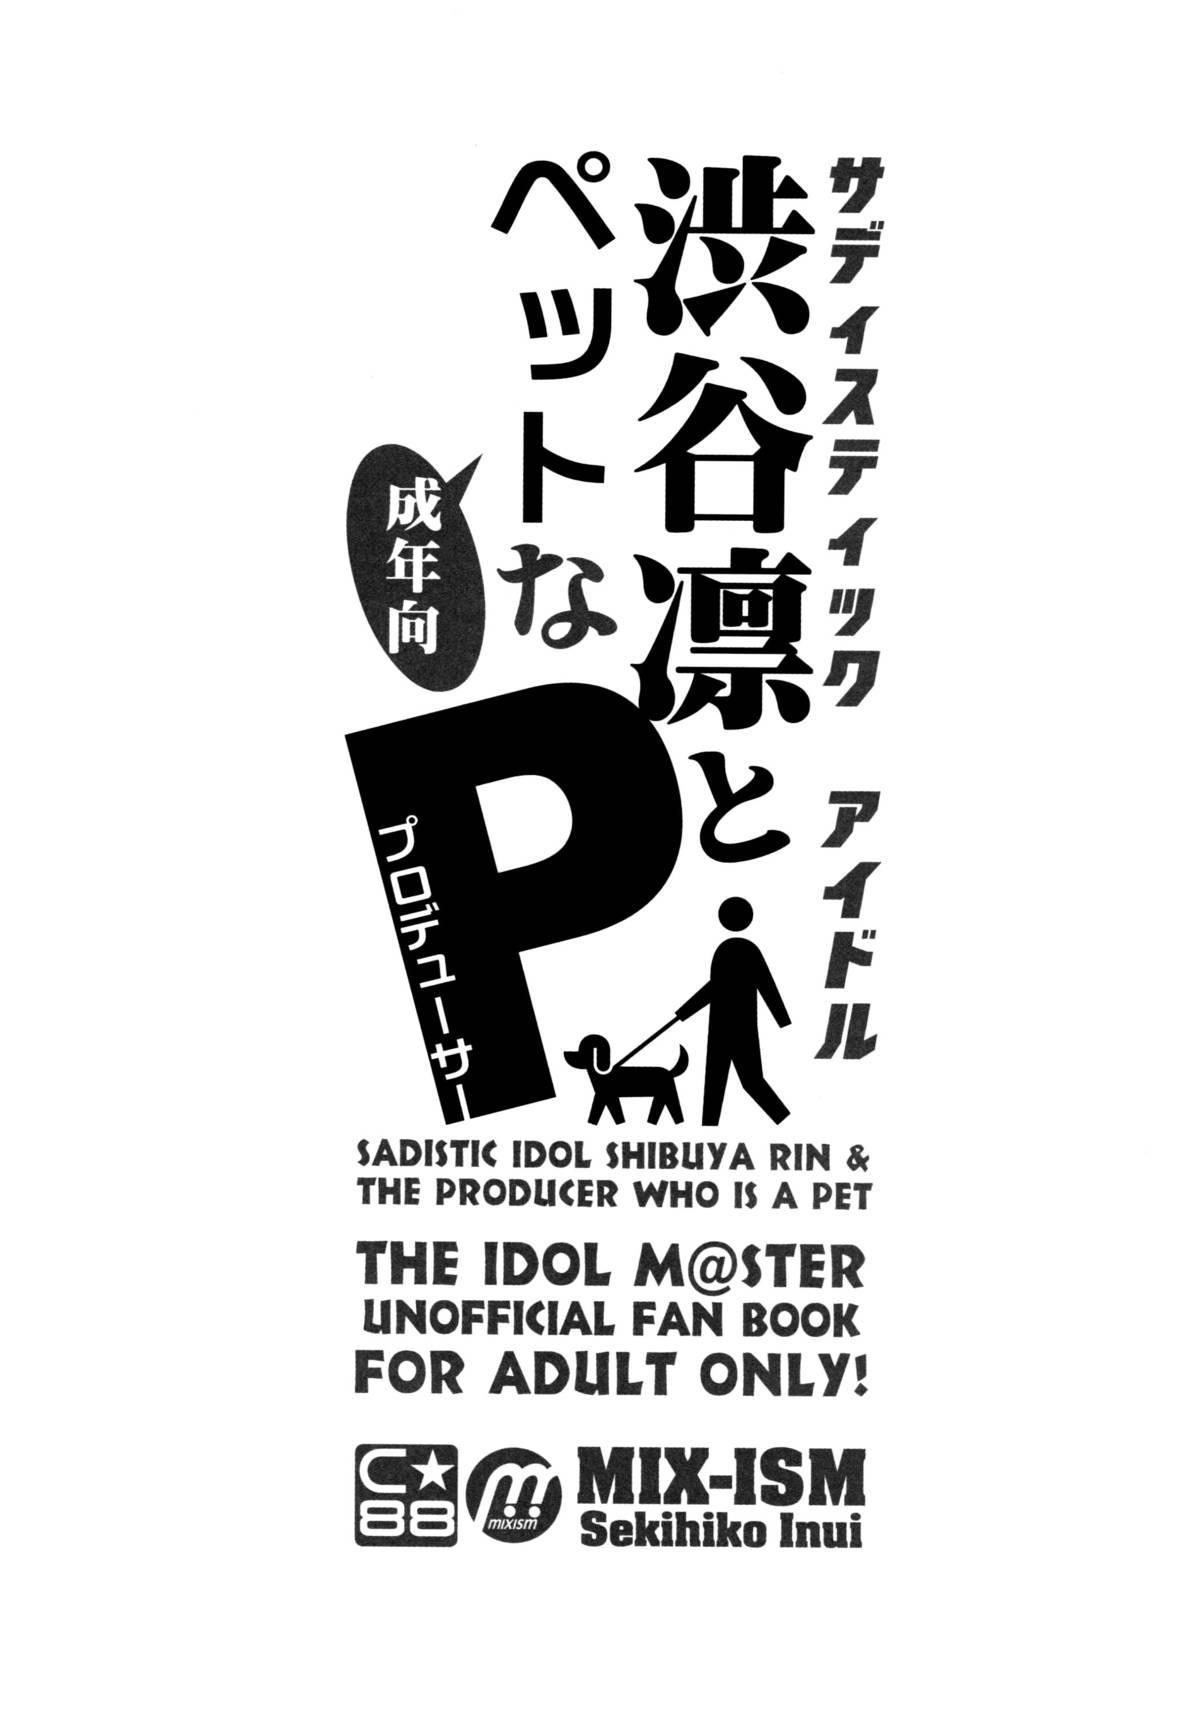 Sadistic Idol Shibuya Rin to Pet na Producer 2